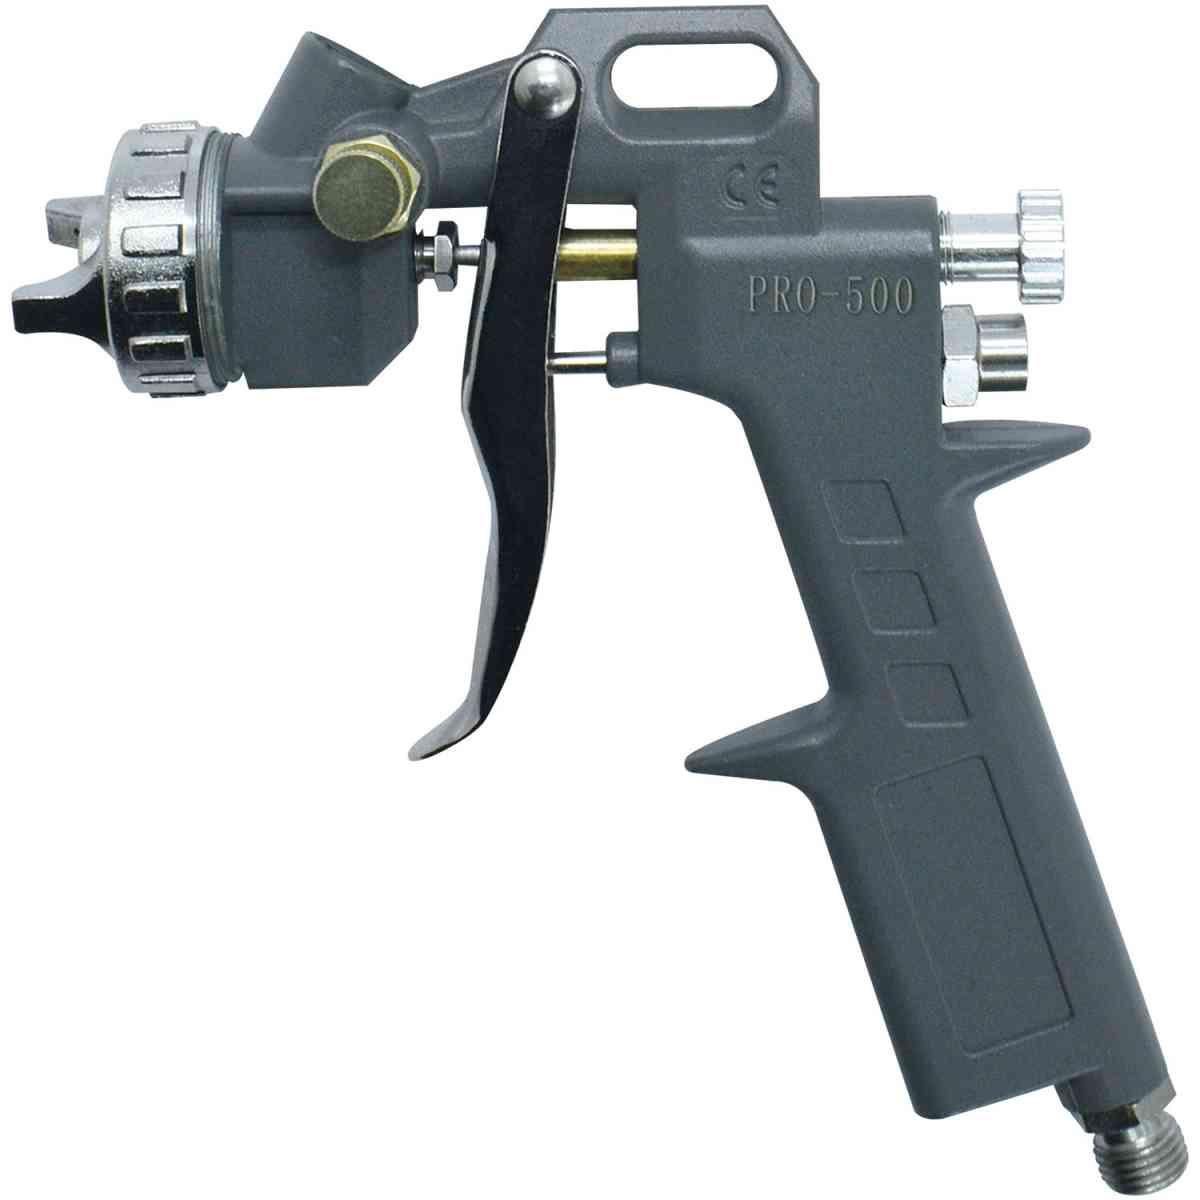 Pistola Para Pintura Gravidade 500ml PDR PRO-500 Bico 1,5mm